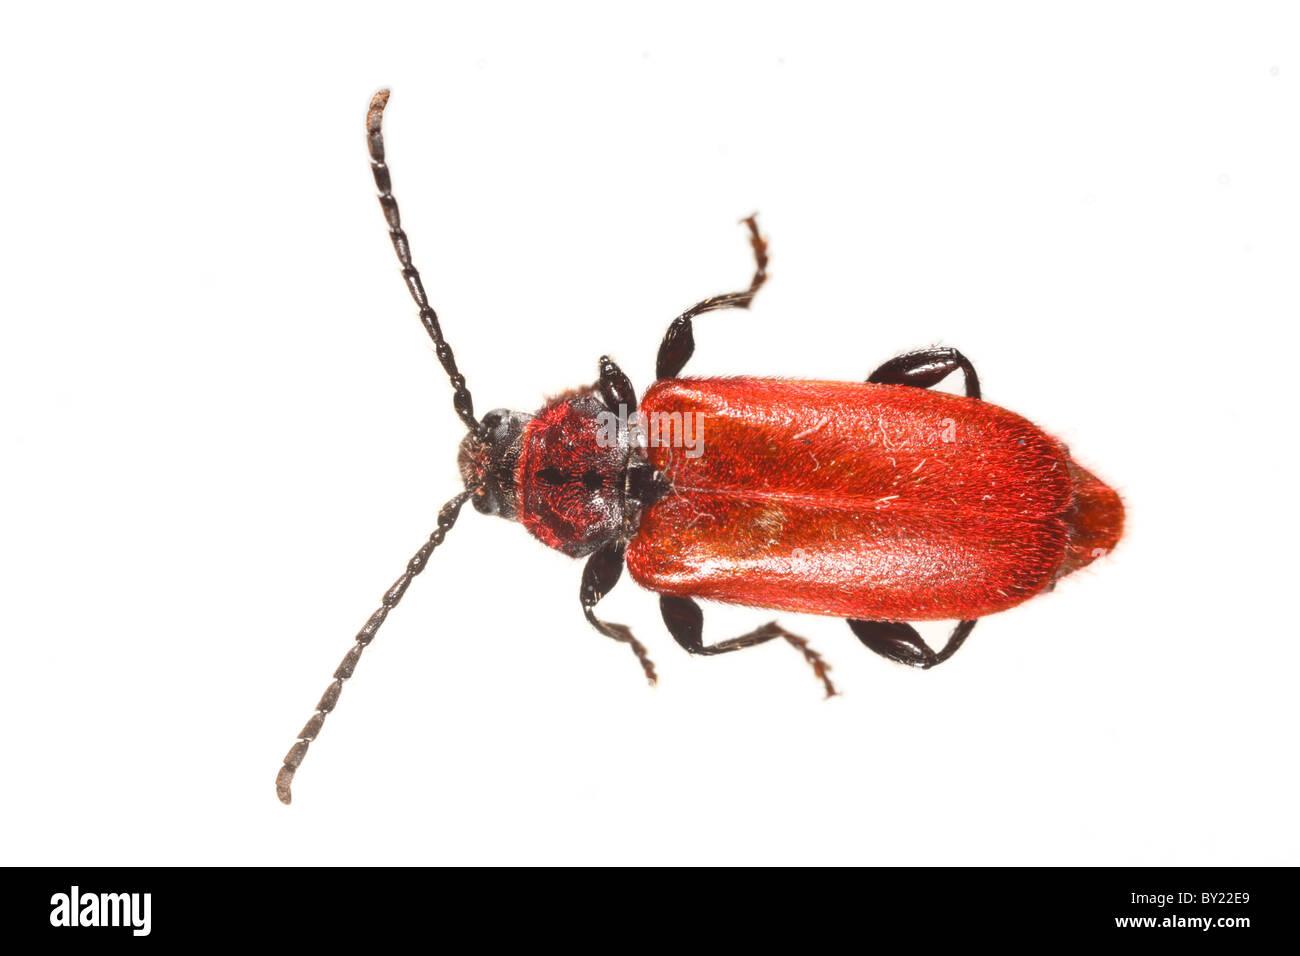 Welsh Oak Longhorn beetle (Pyrrhidium sanguineum). Powys, Wales. - Stock Image